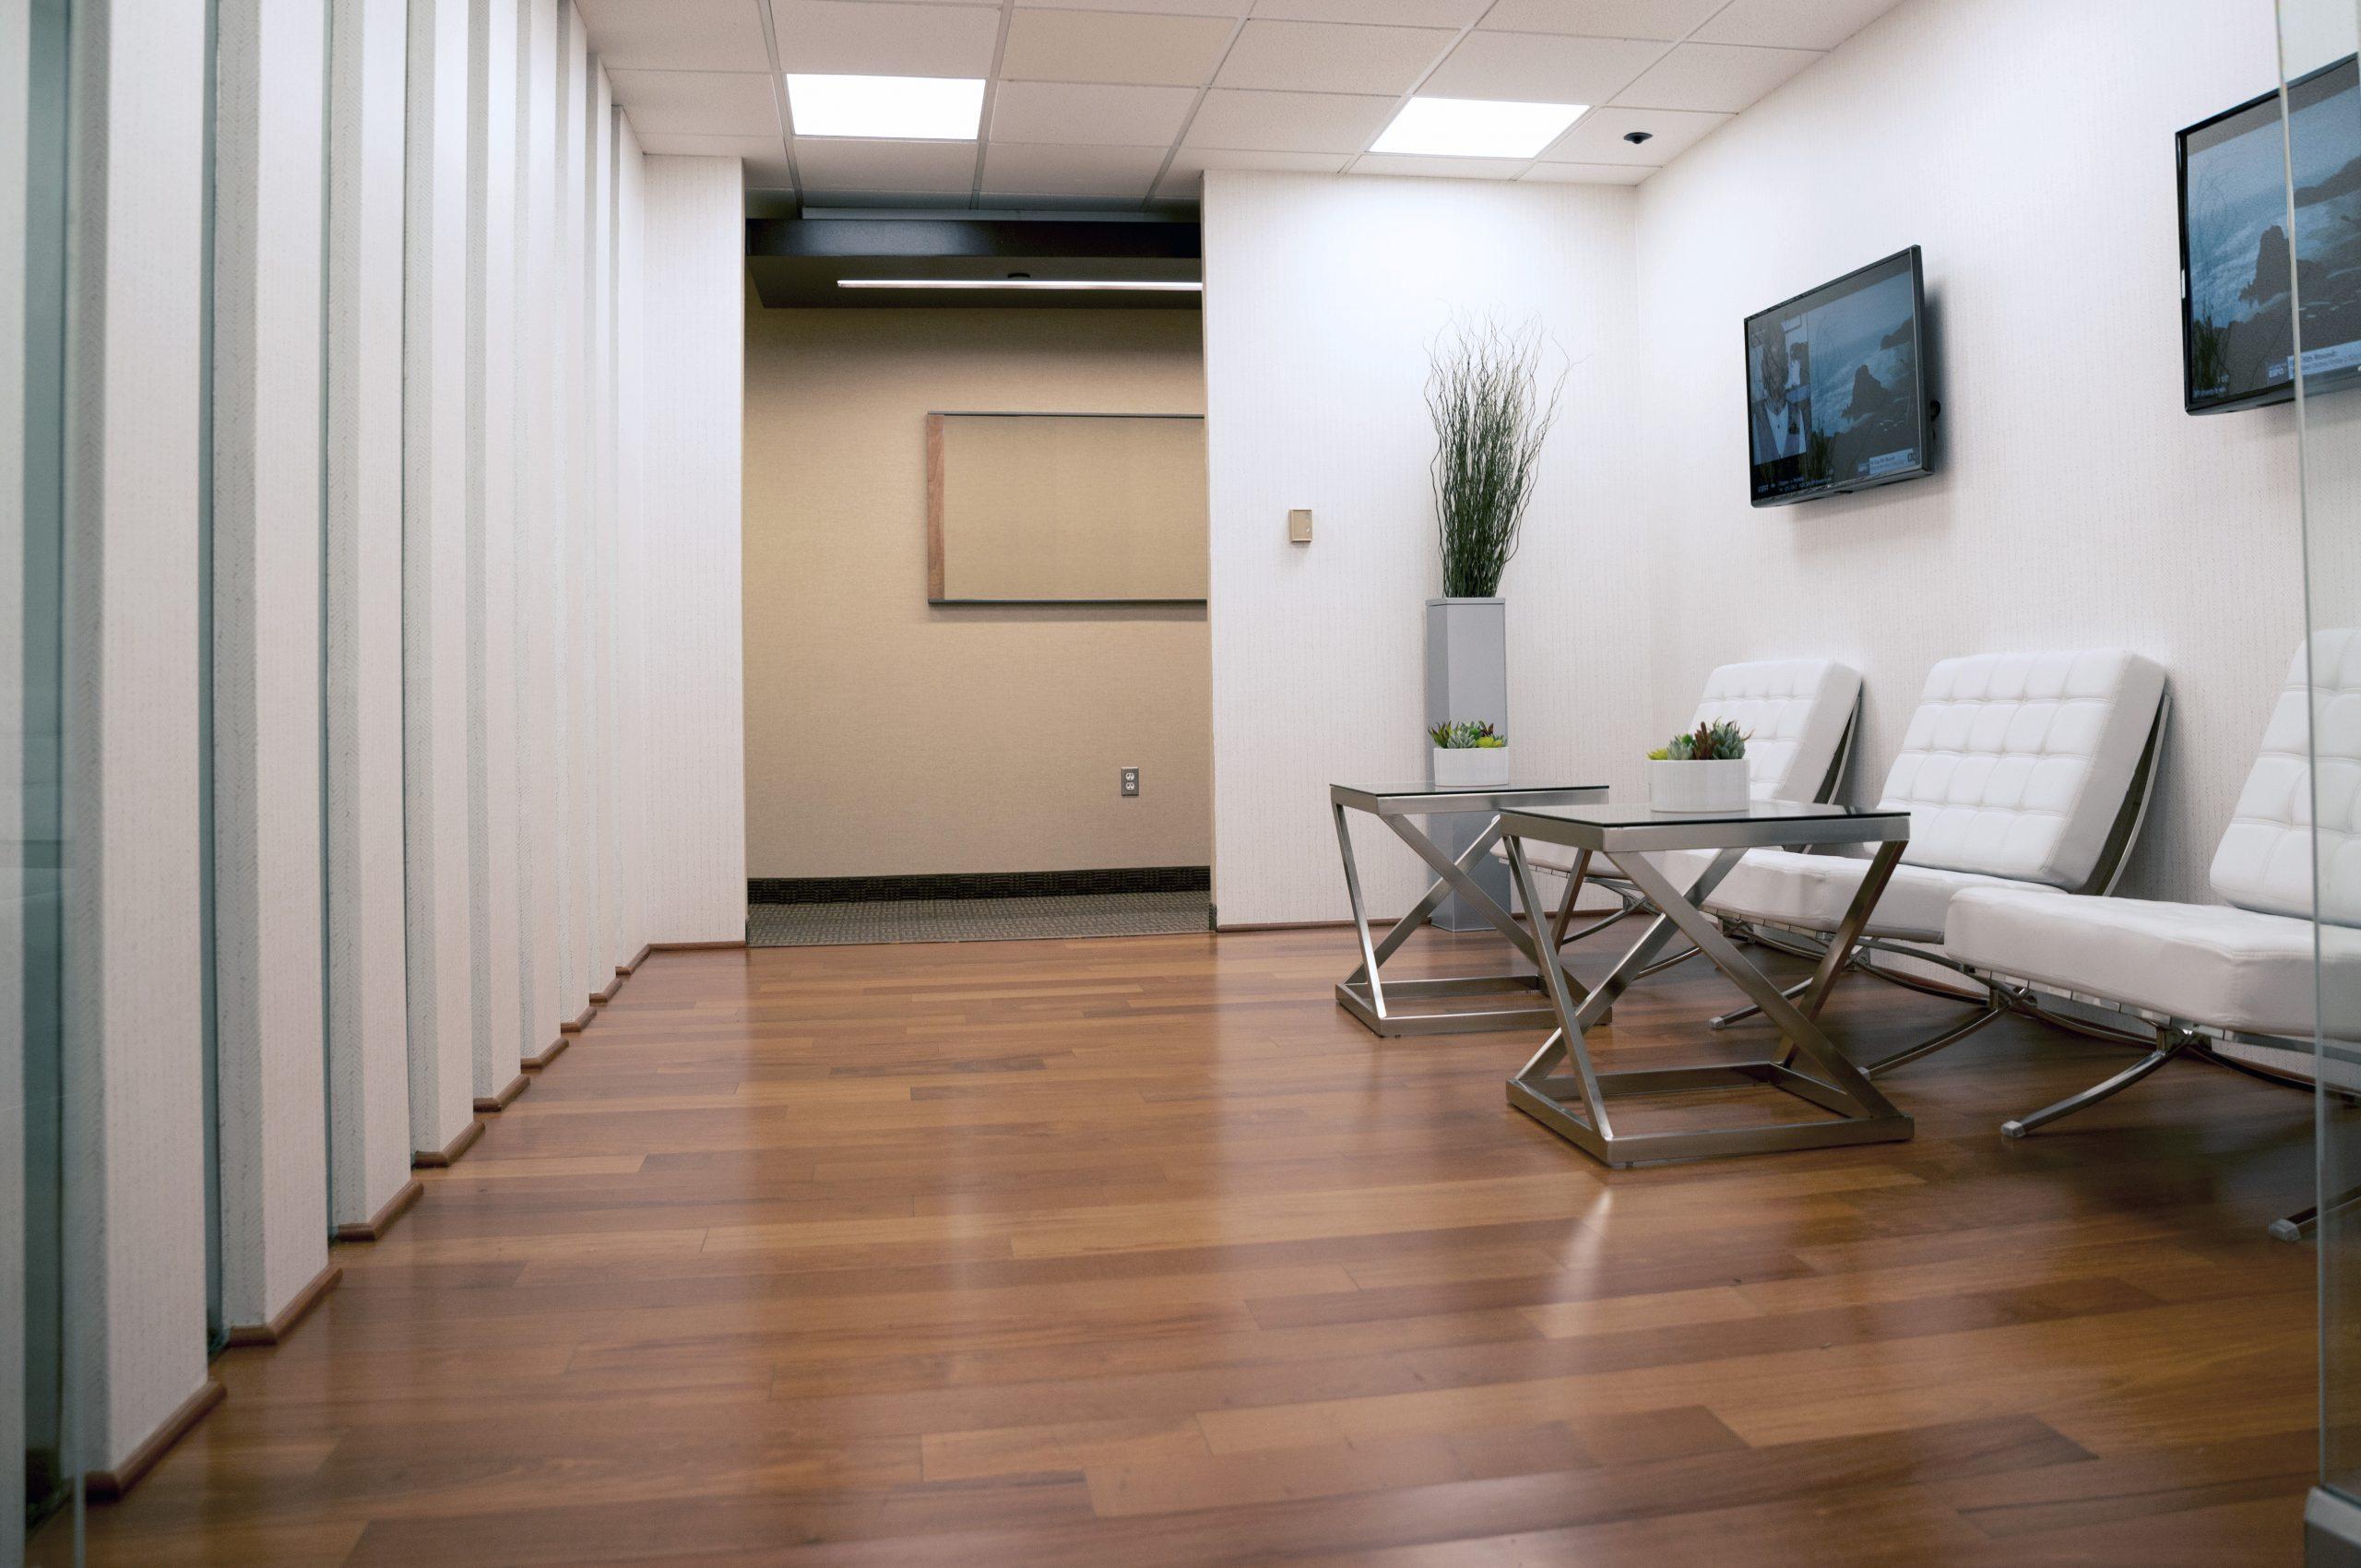 Office Interior 9